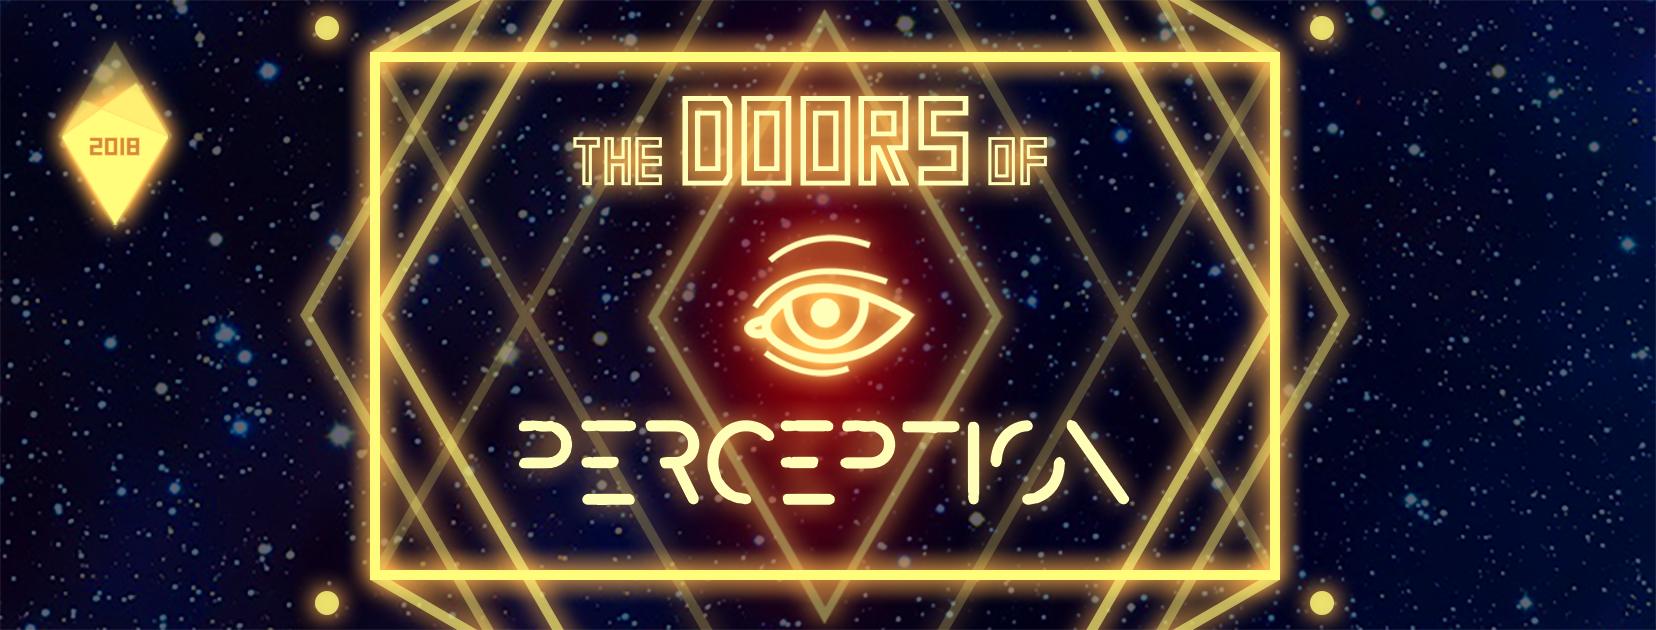 Doors of Perception FB Banner.png